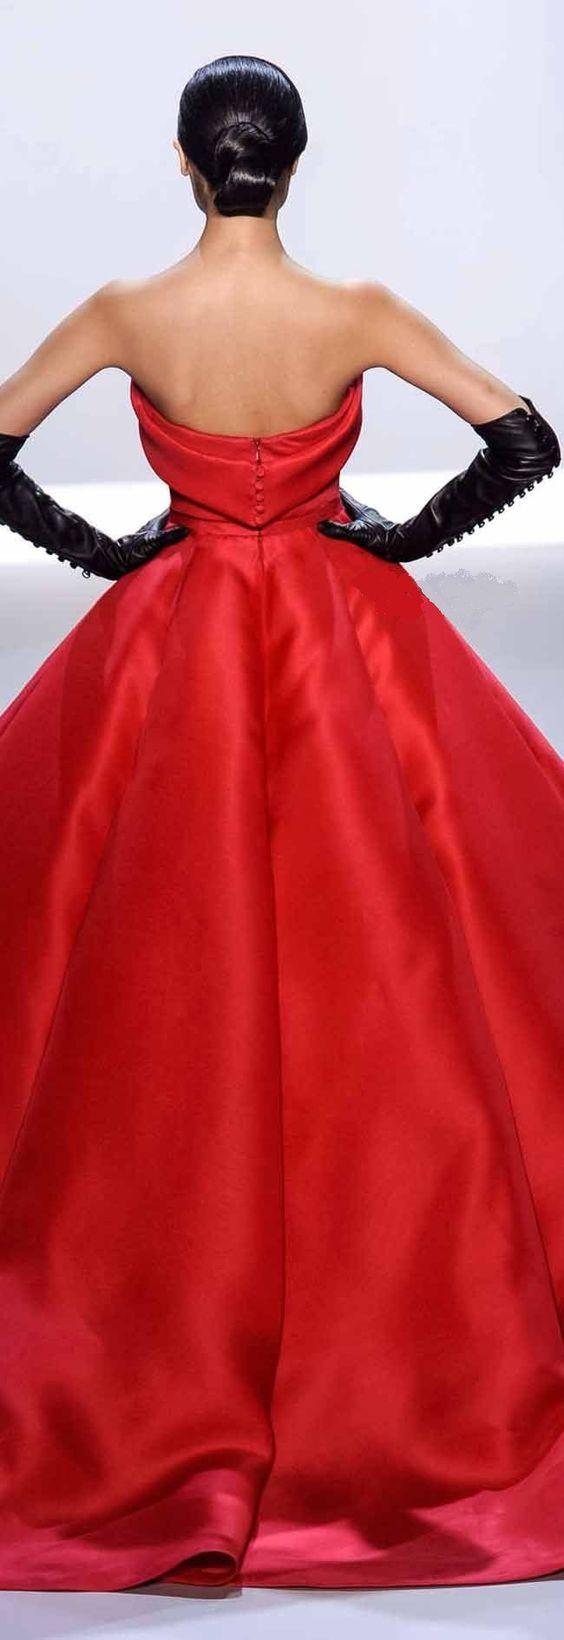 19232 Best Accessorize My Dress A Seasonal Fashion